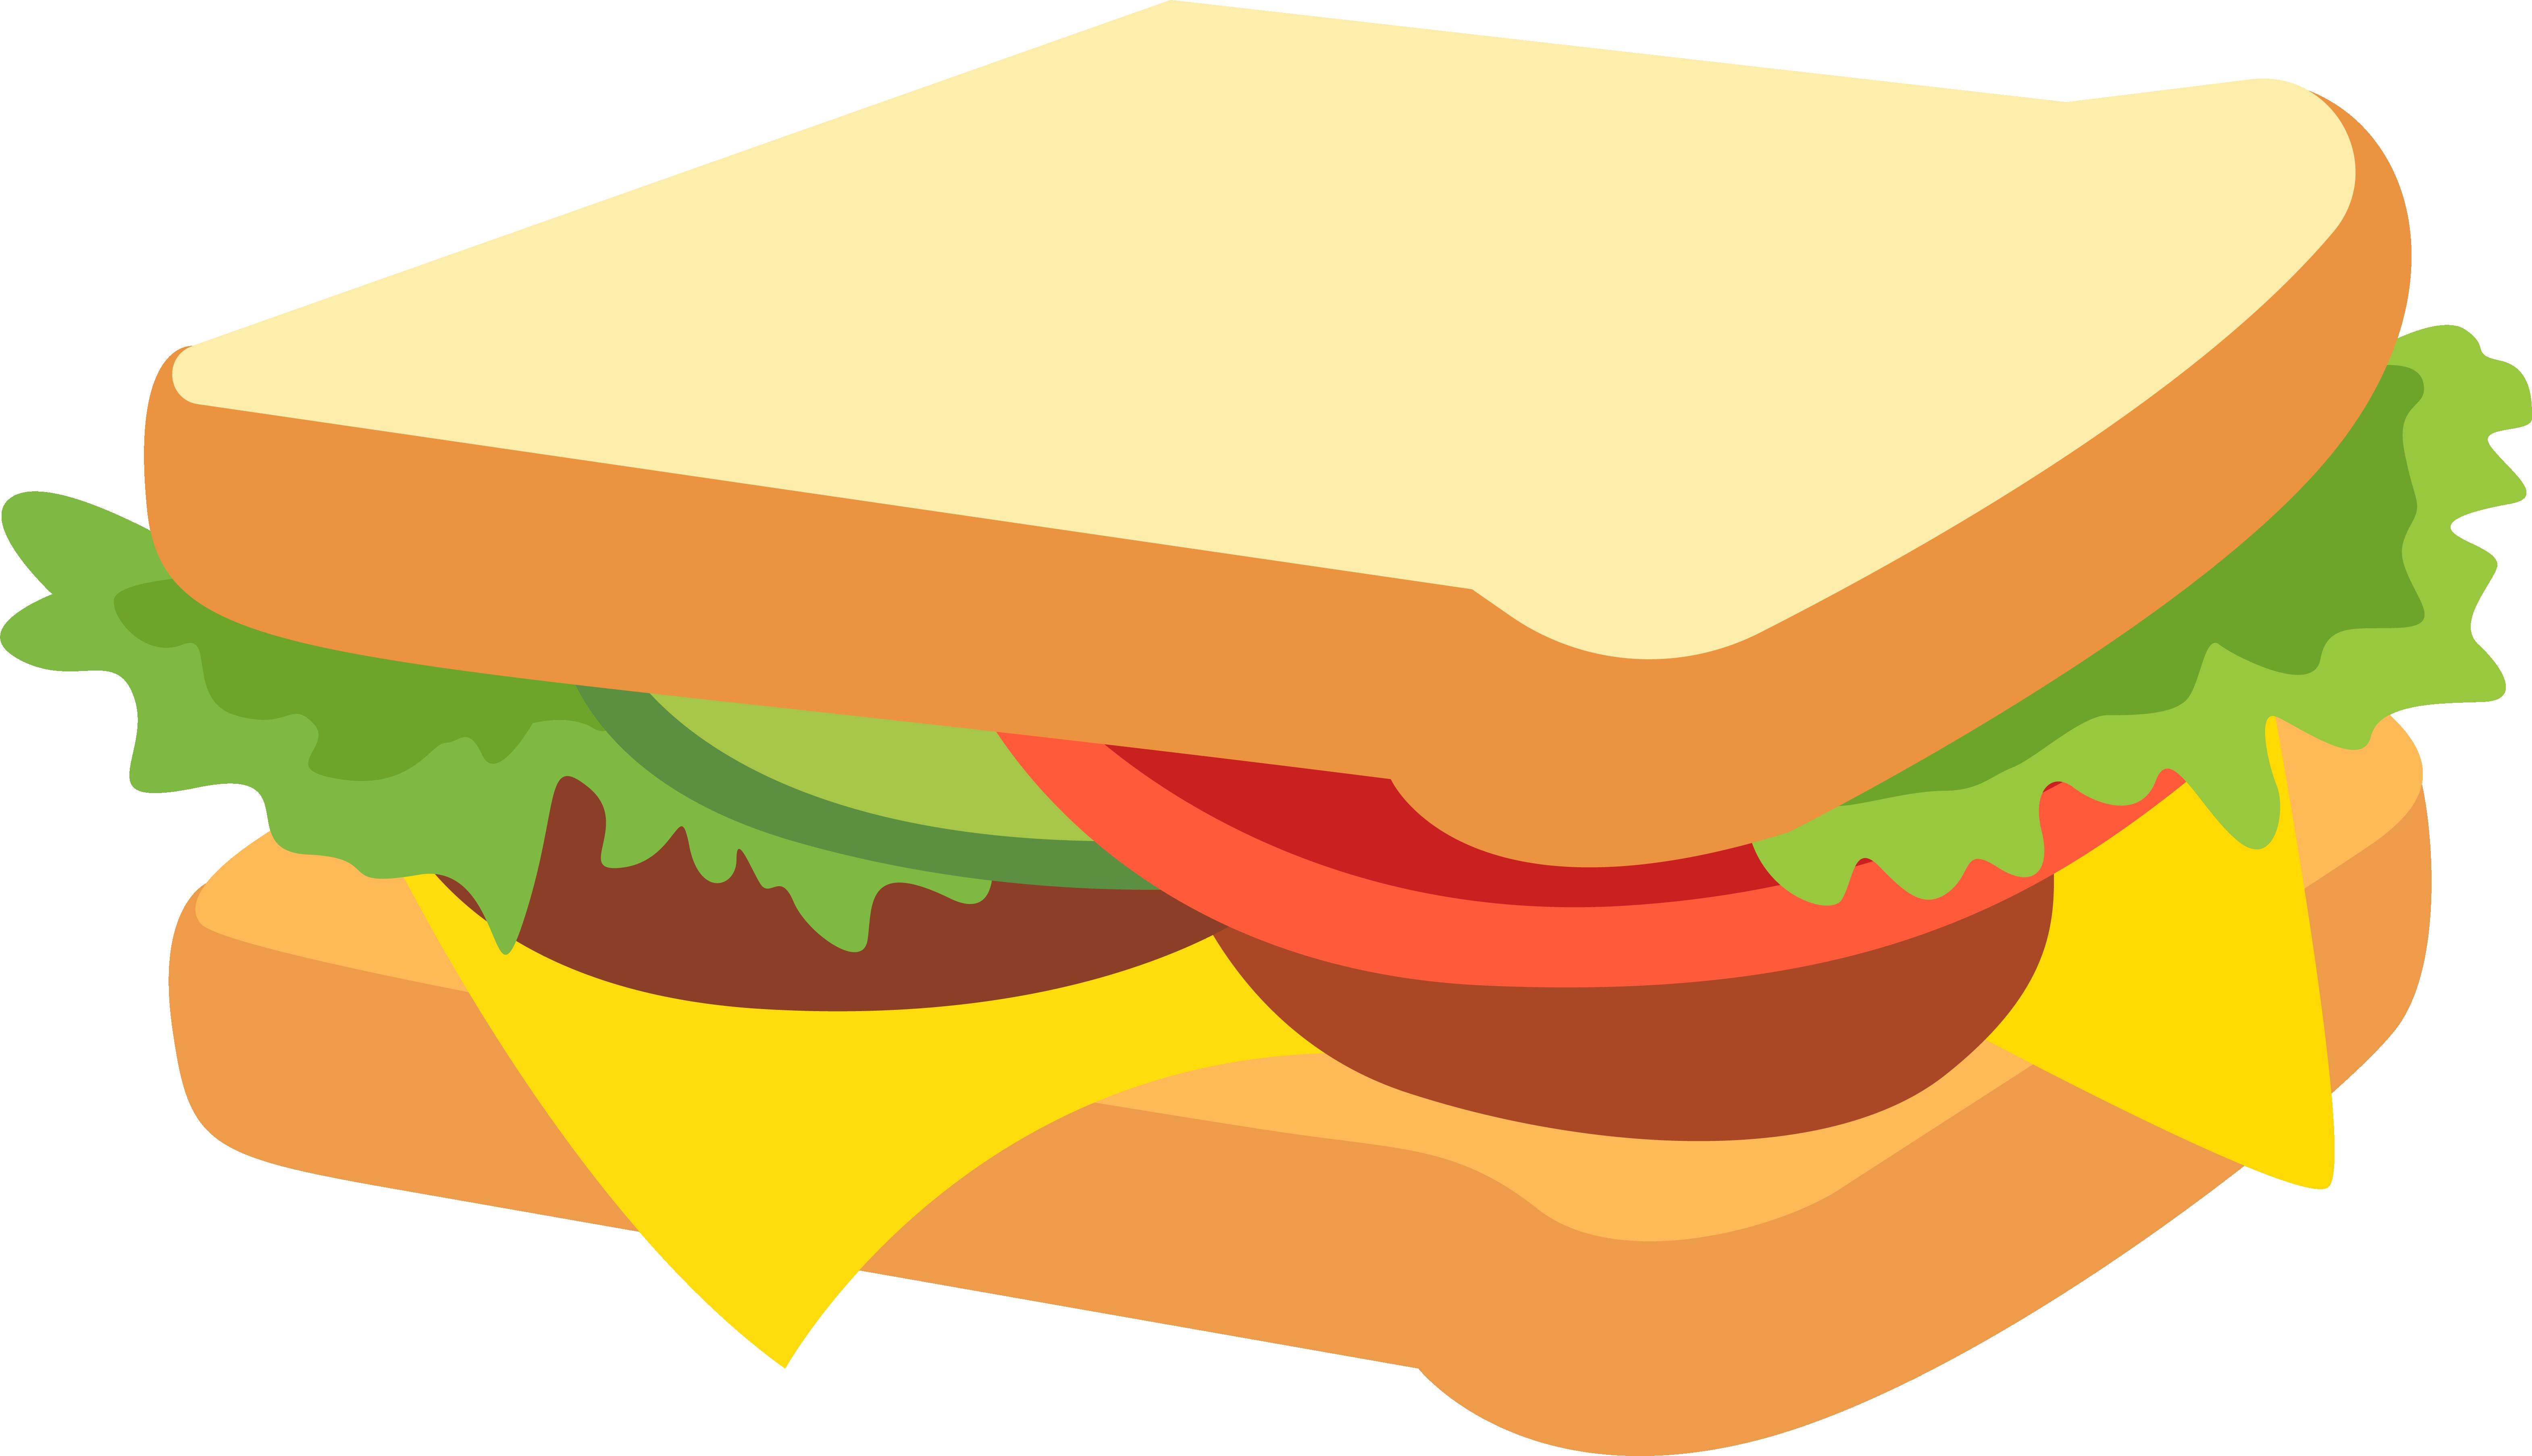 Sandwich Vector Transparent Background Illustration Feelings Activities